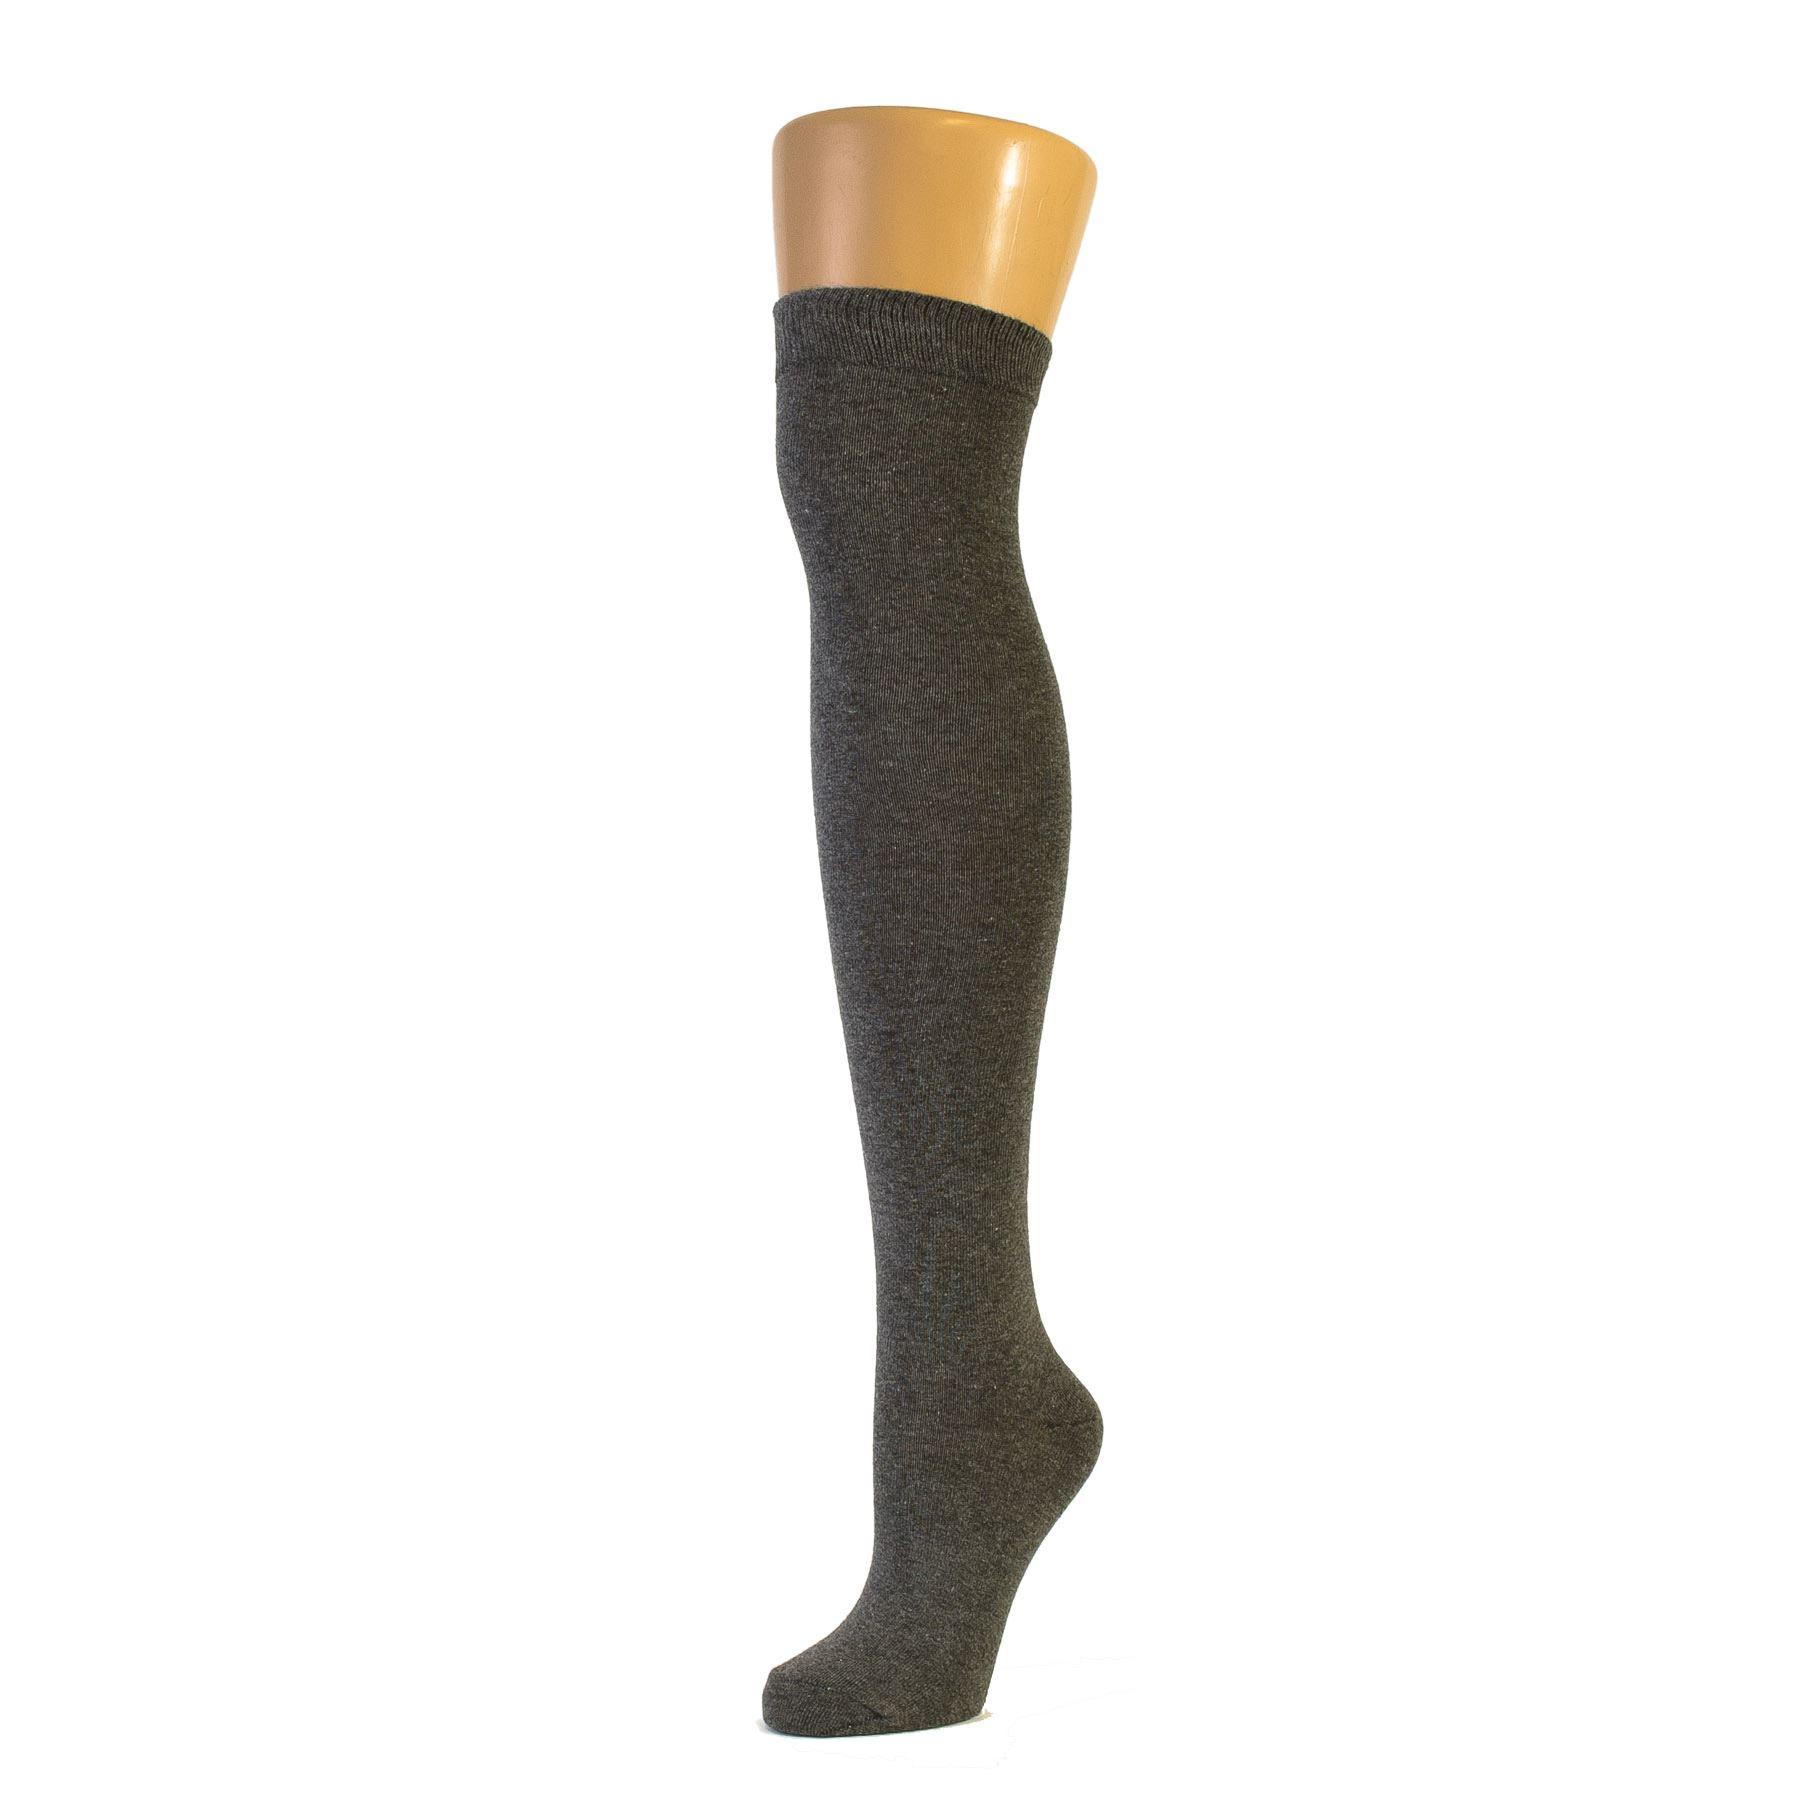 chaussettes montantes ebay. Black Bedroom Furniture Sets. Home Design Ideas